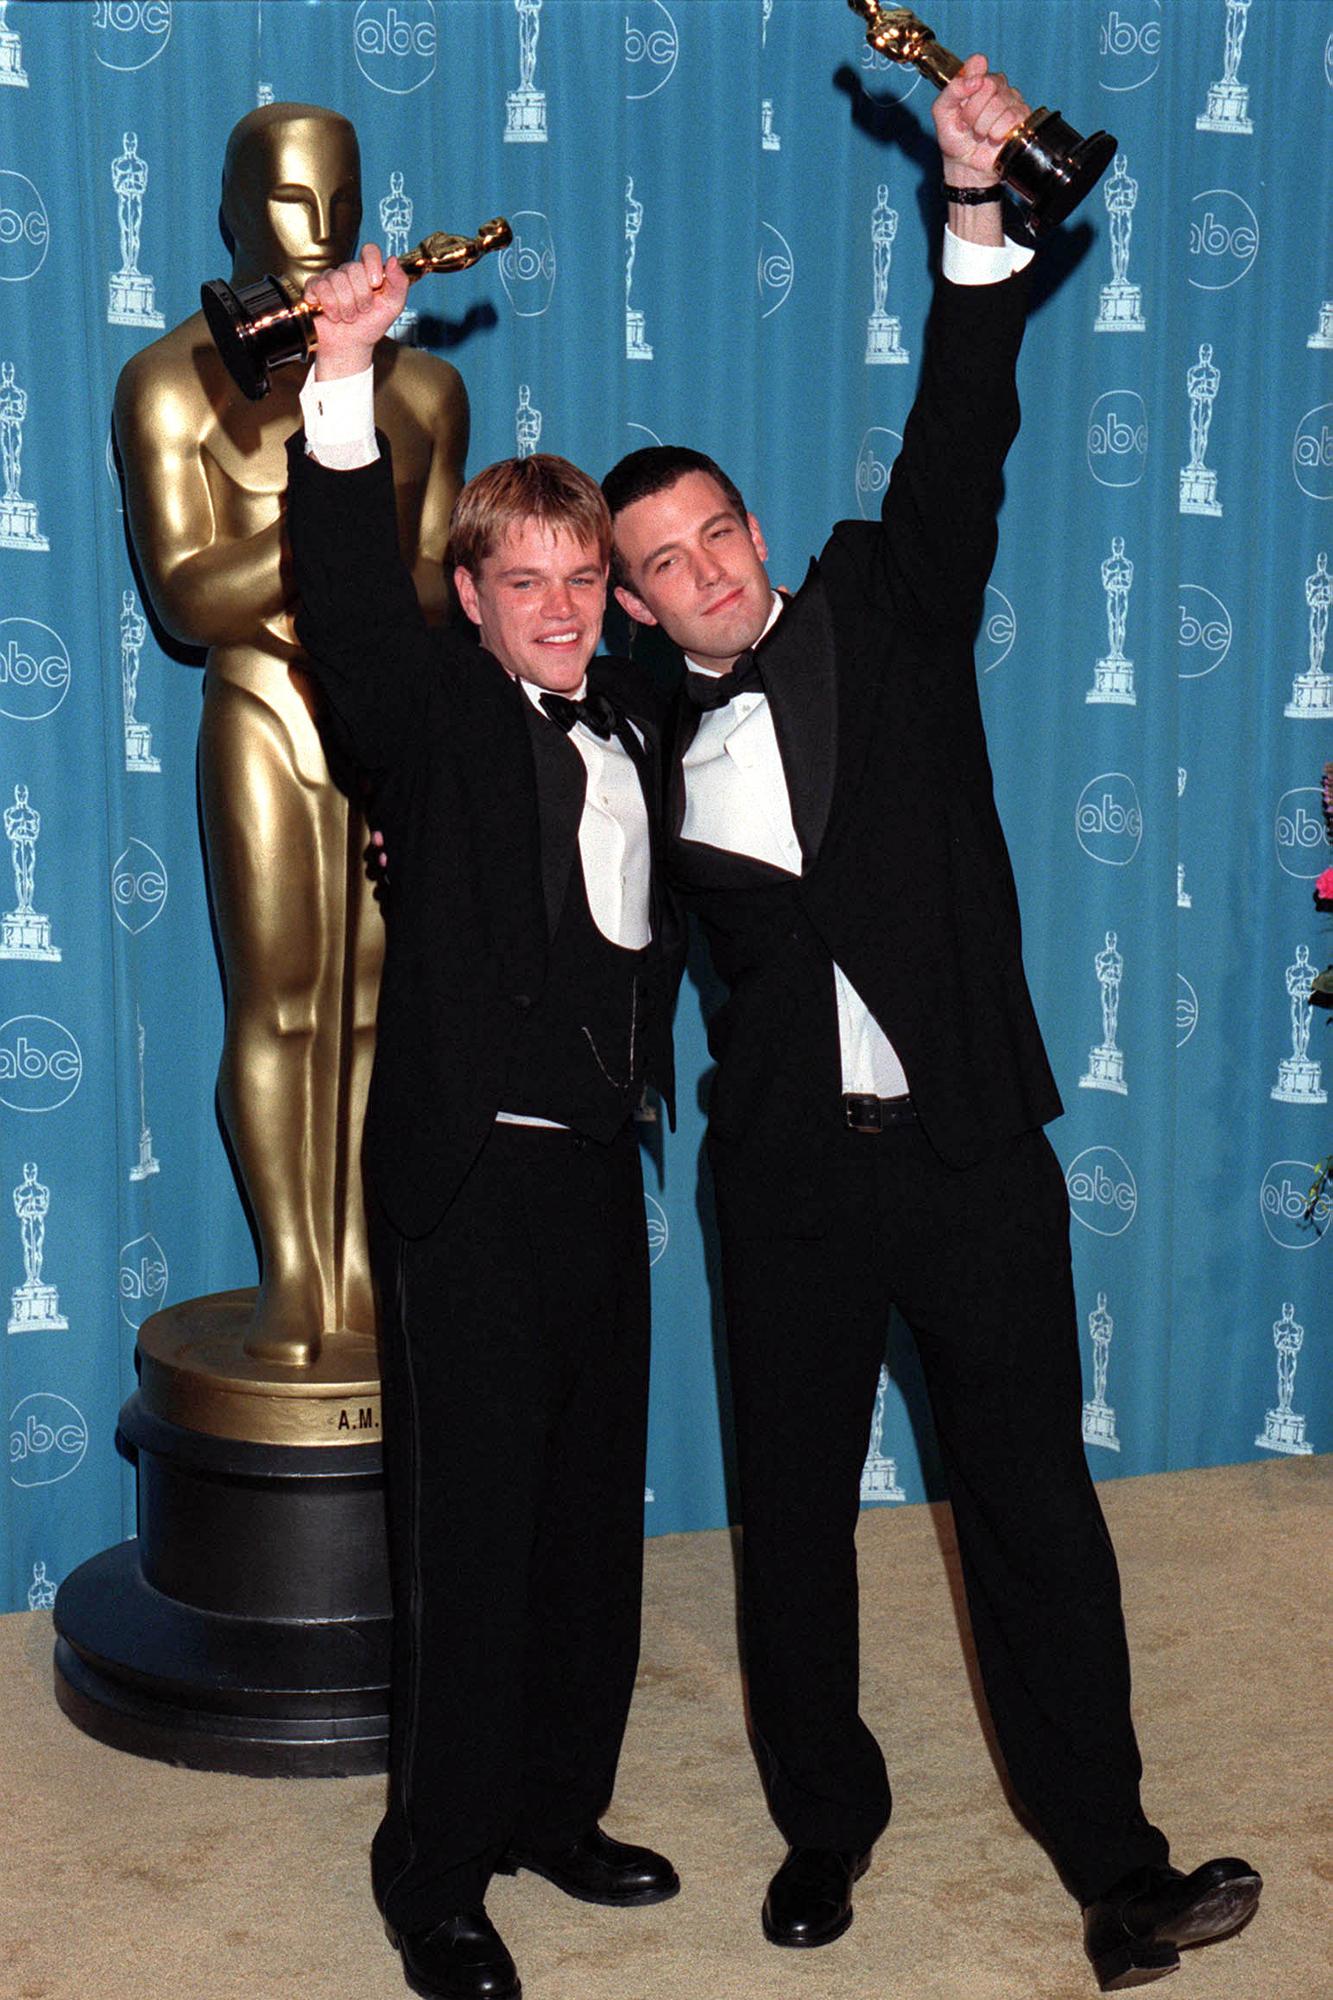 70th Annual Academy Awards - Press Room